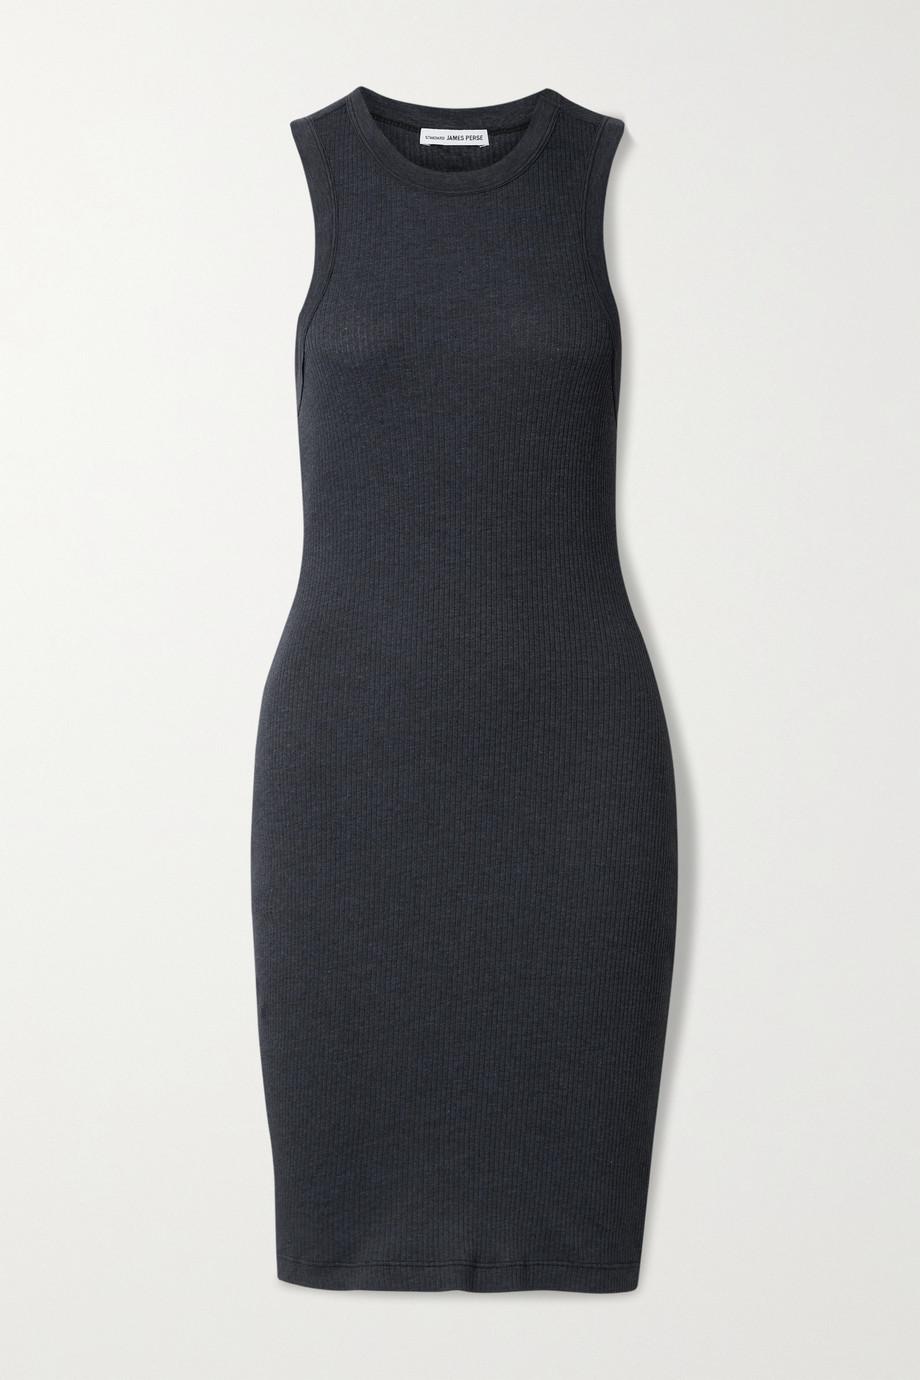 James Perse Ribbed cotton-blend jersey mini dress